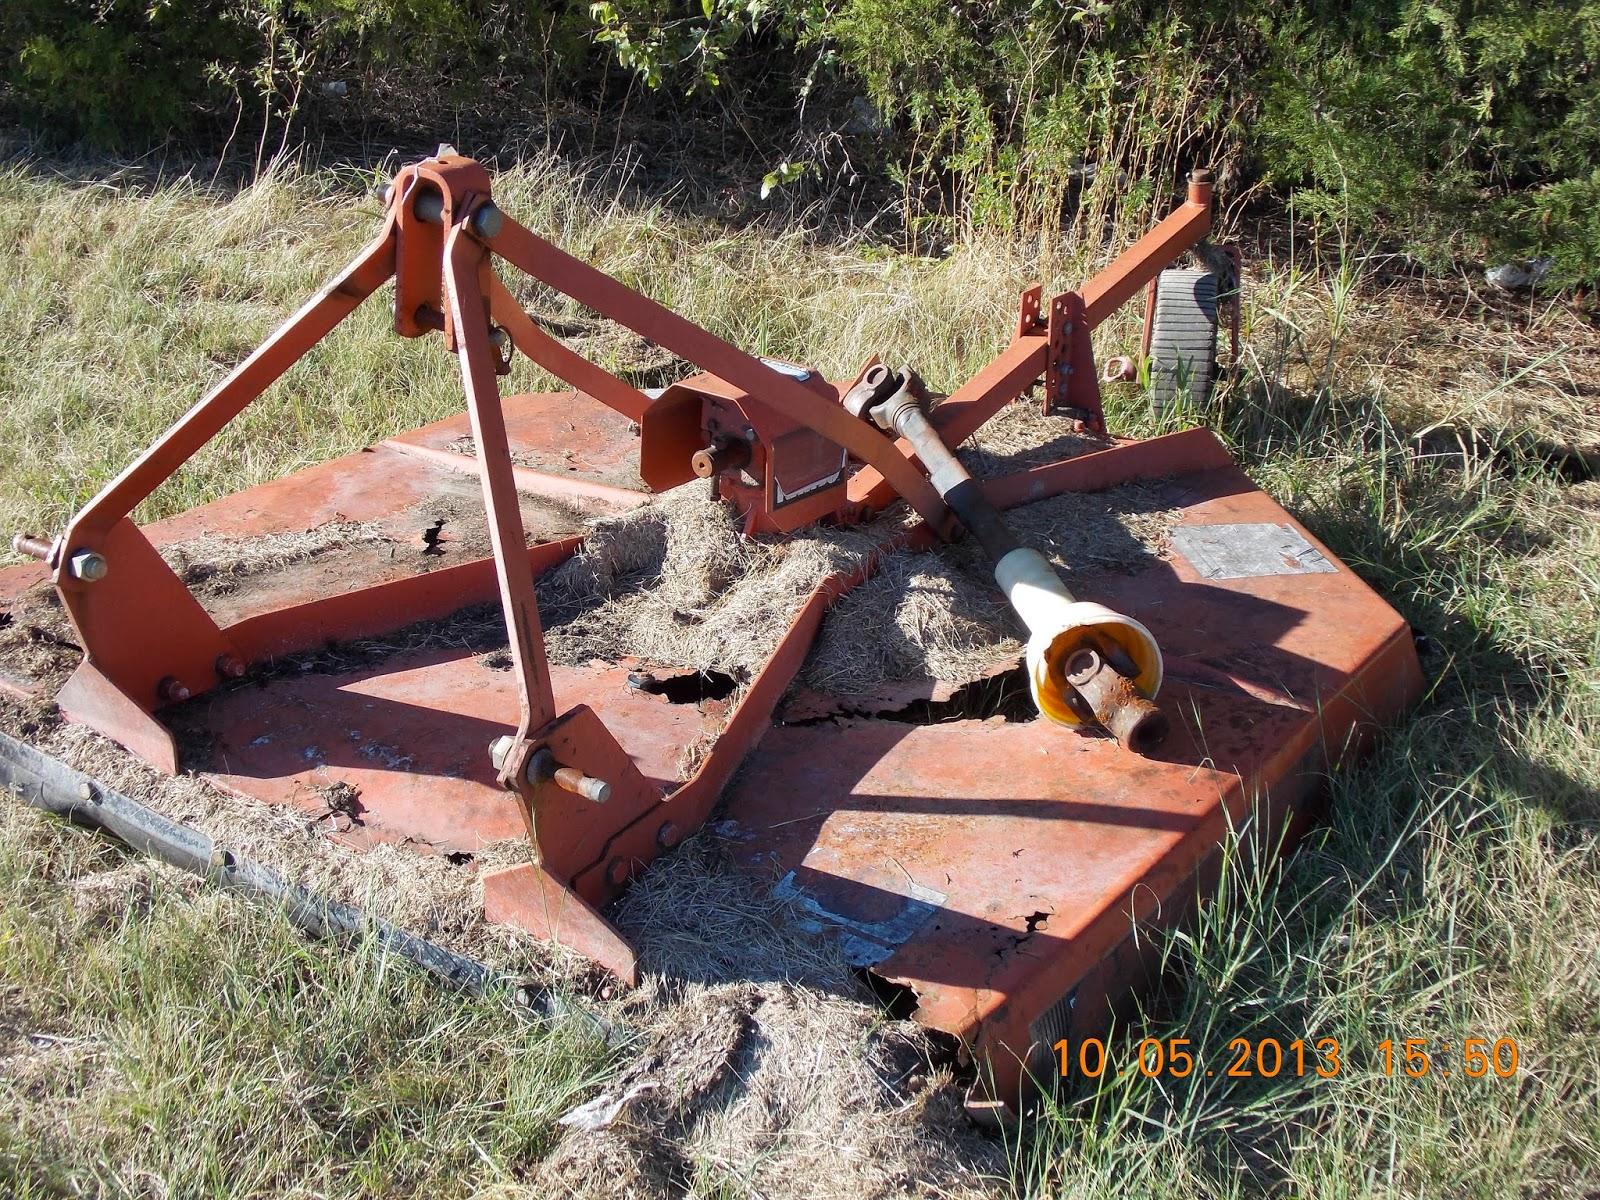 Tractor Steering Parts For Rhino : Parking zone rhino shredder mower parts